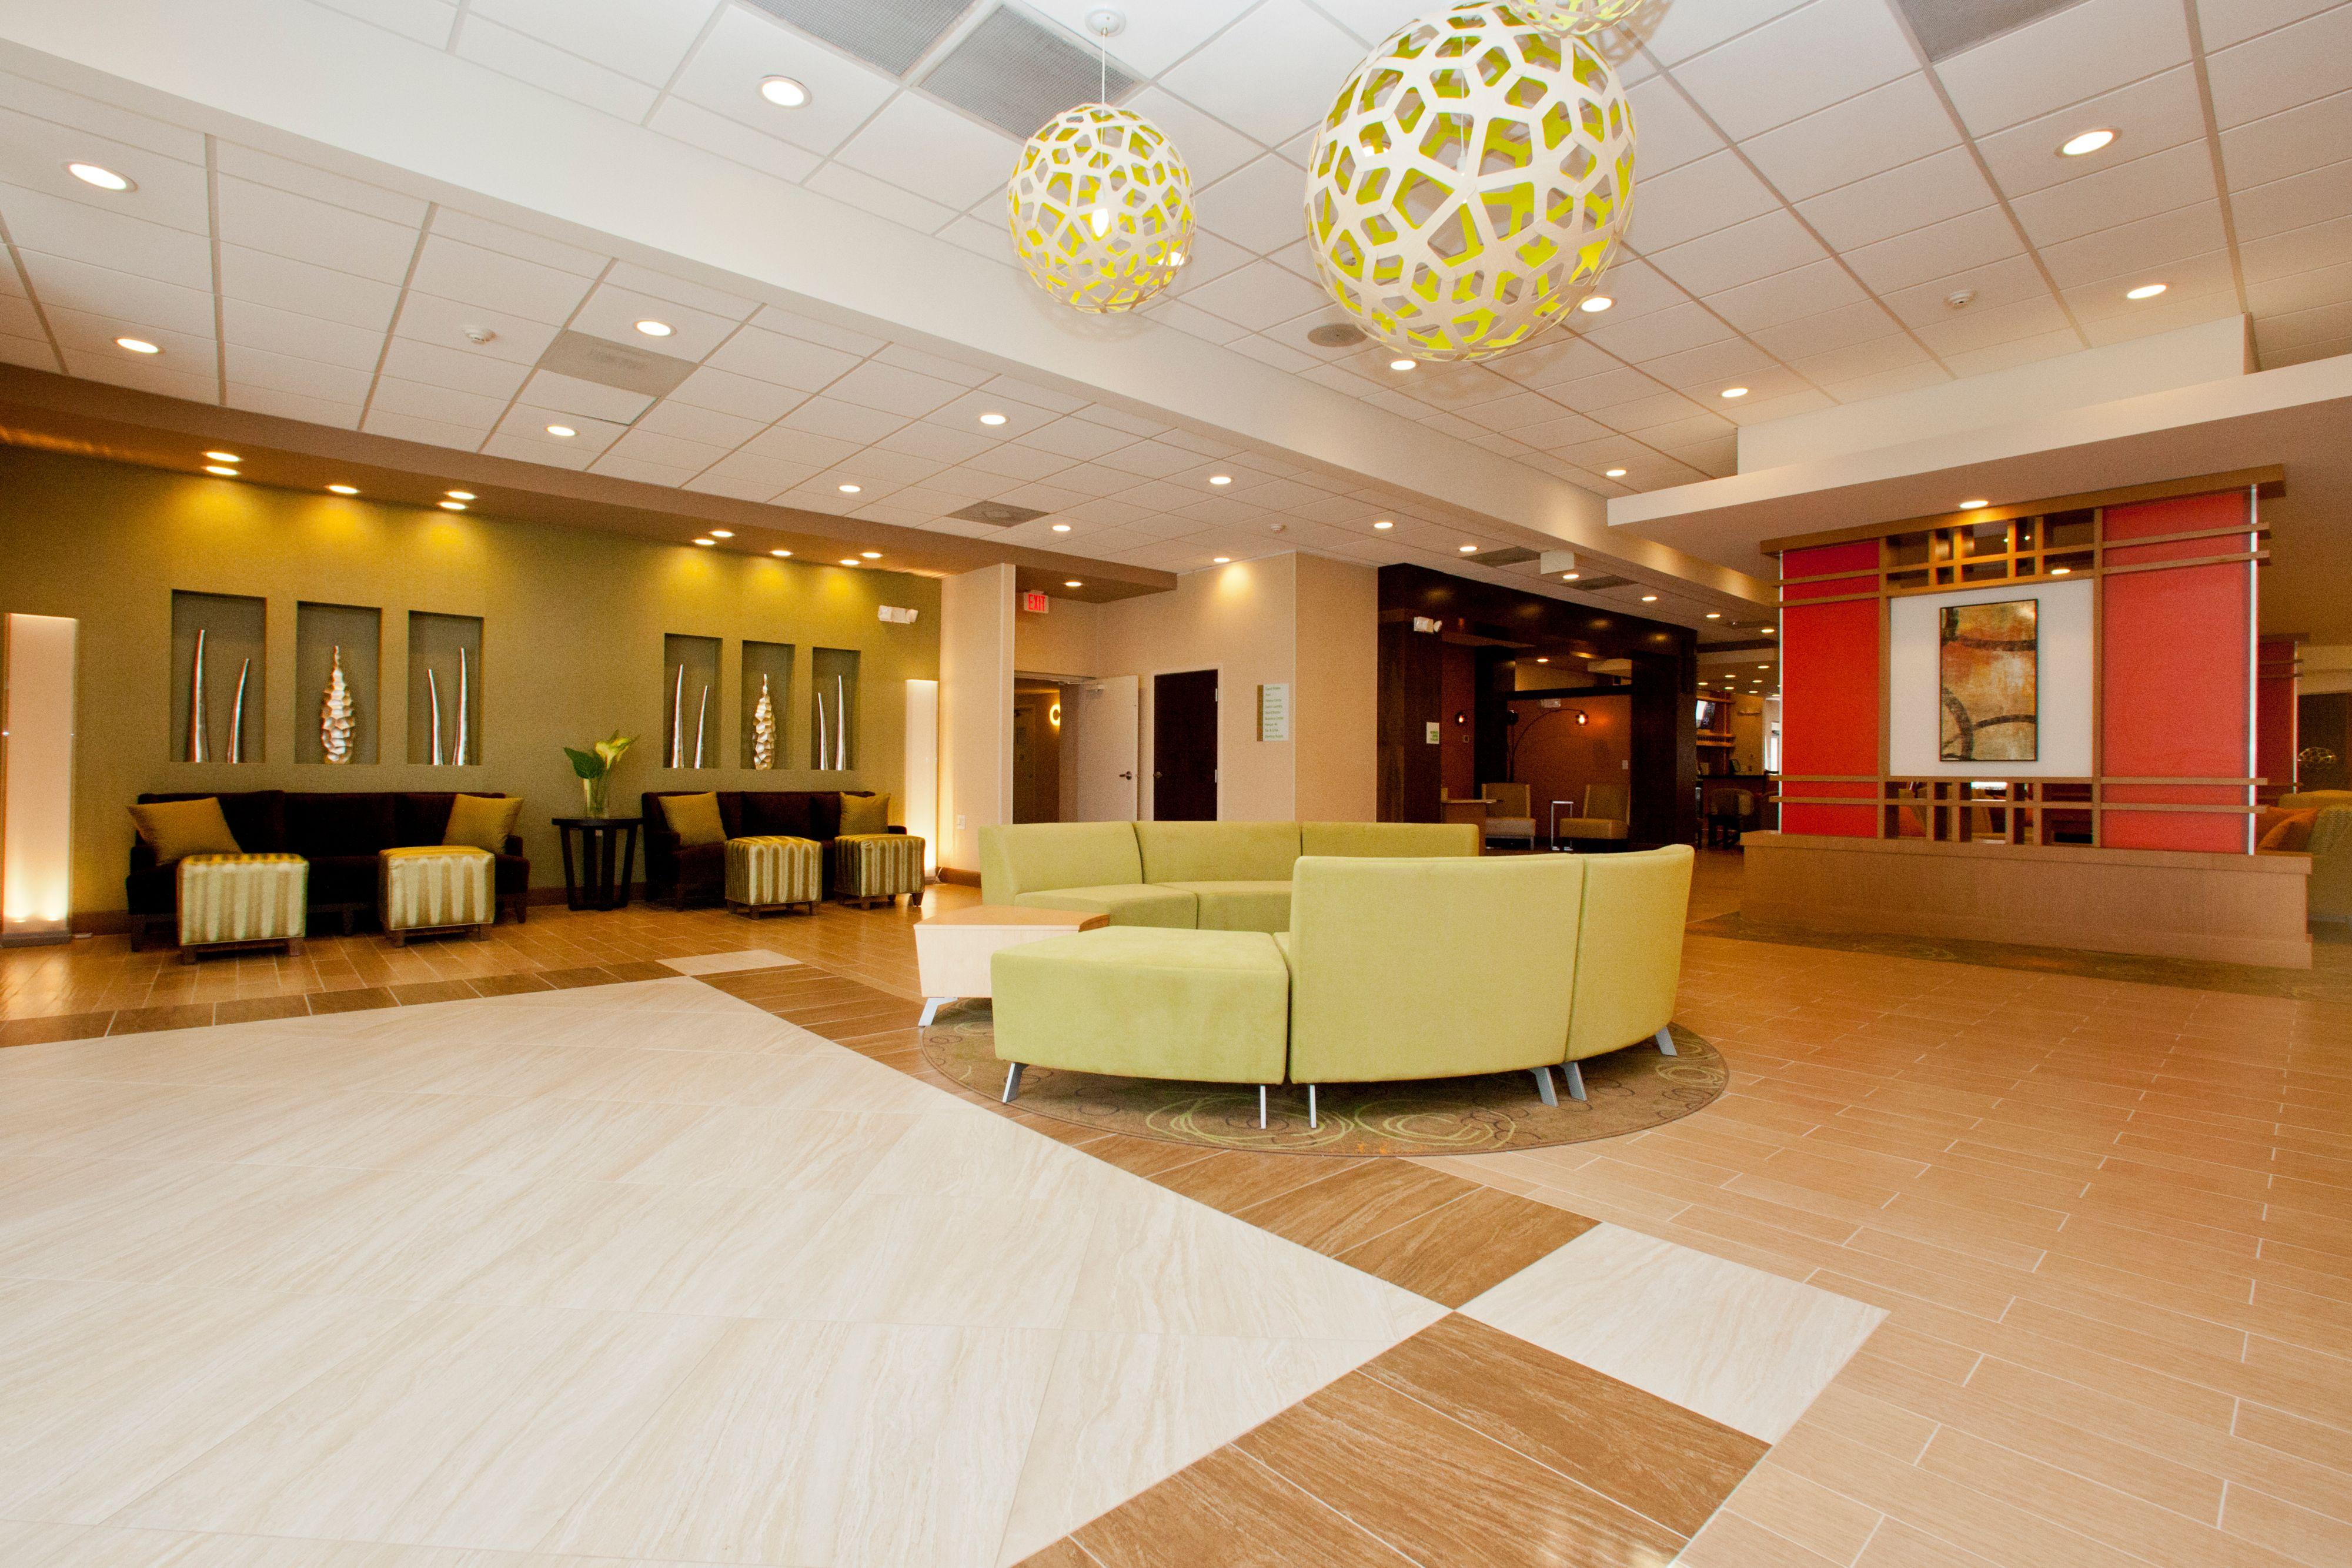 Holiday Inn Greensboro Airport image 4